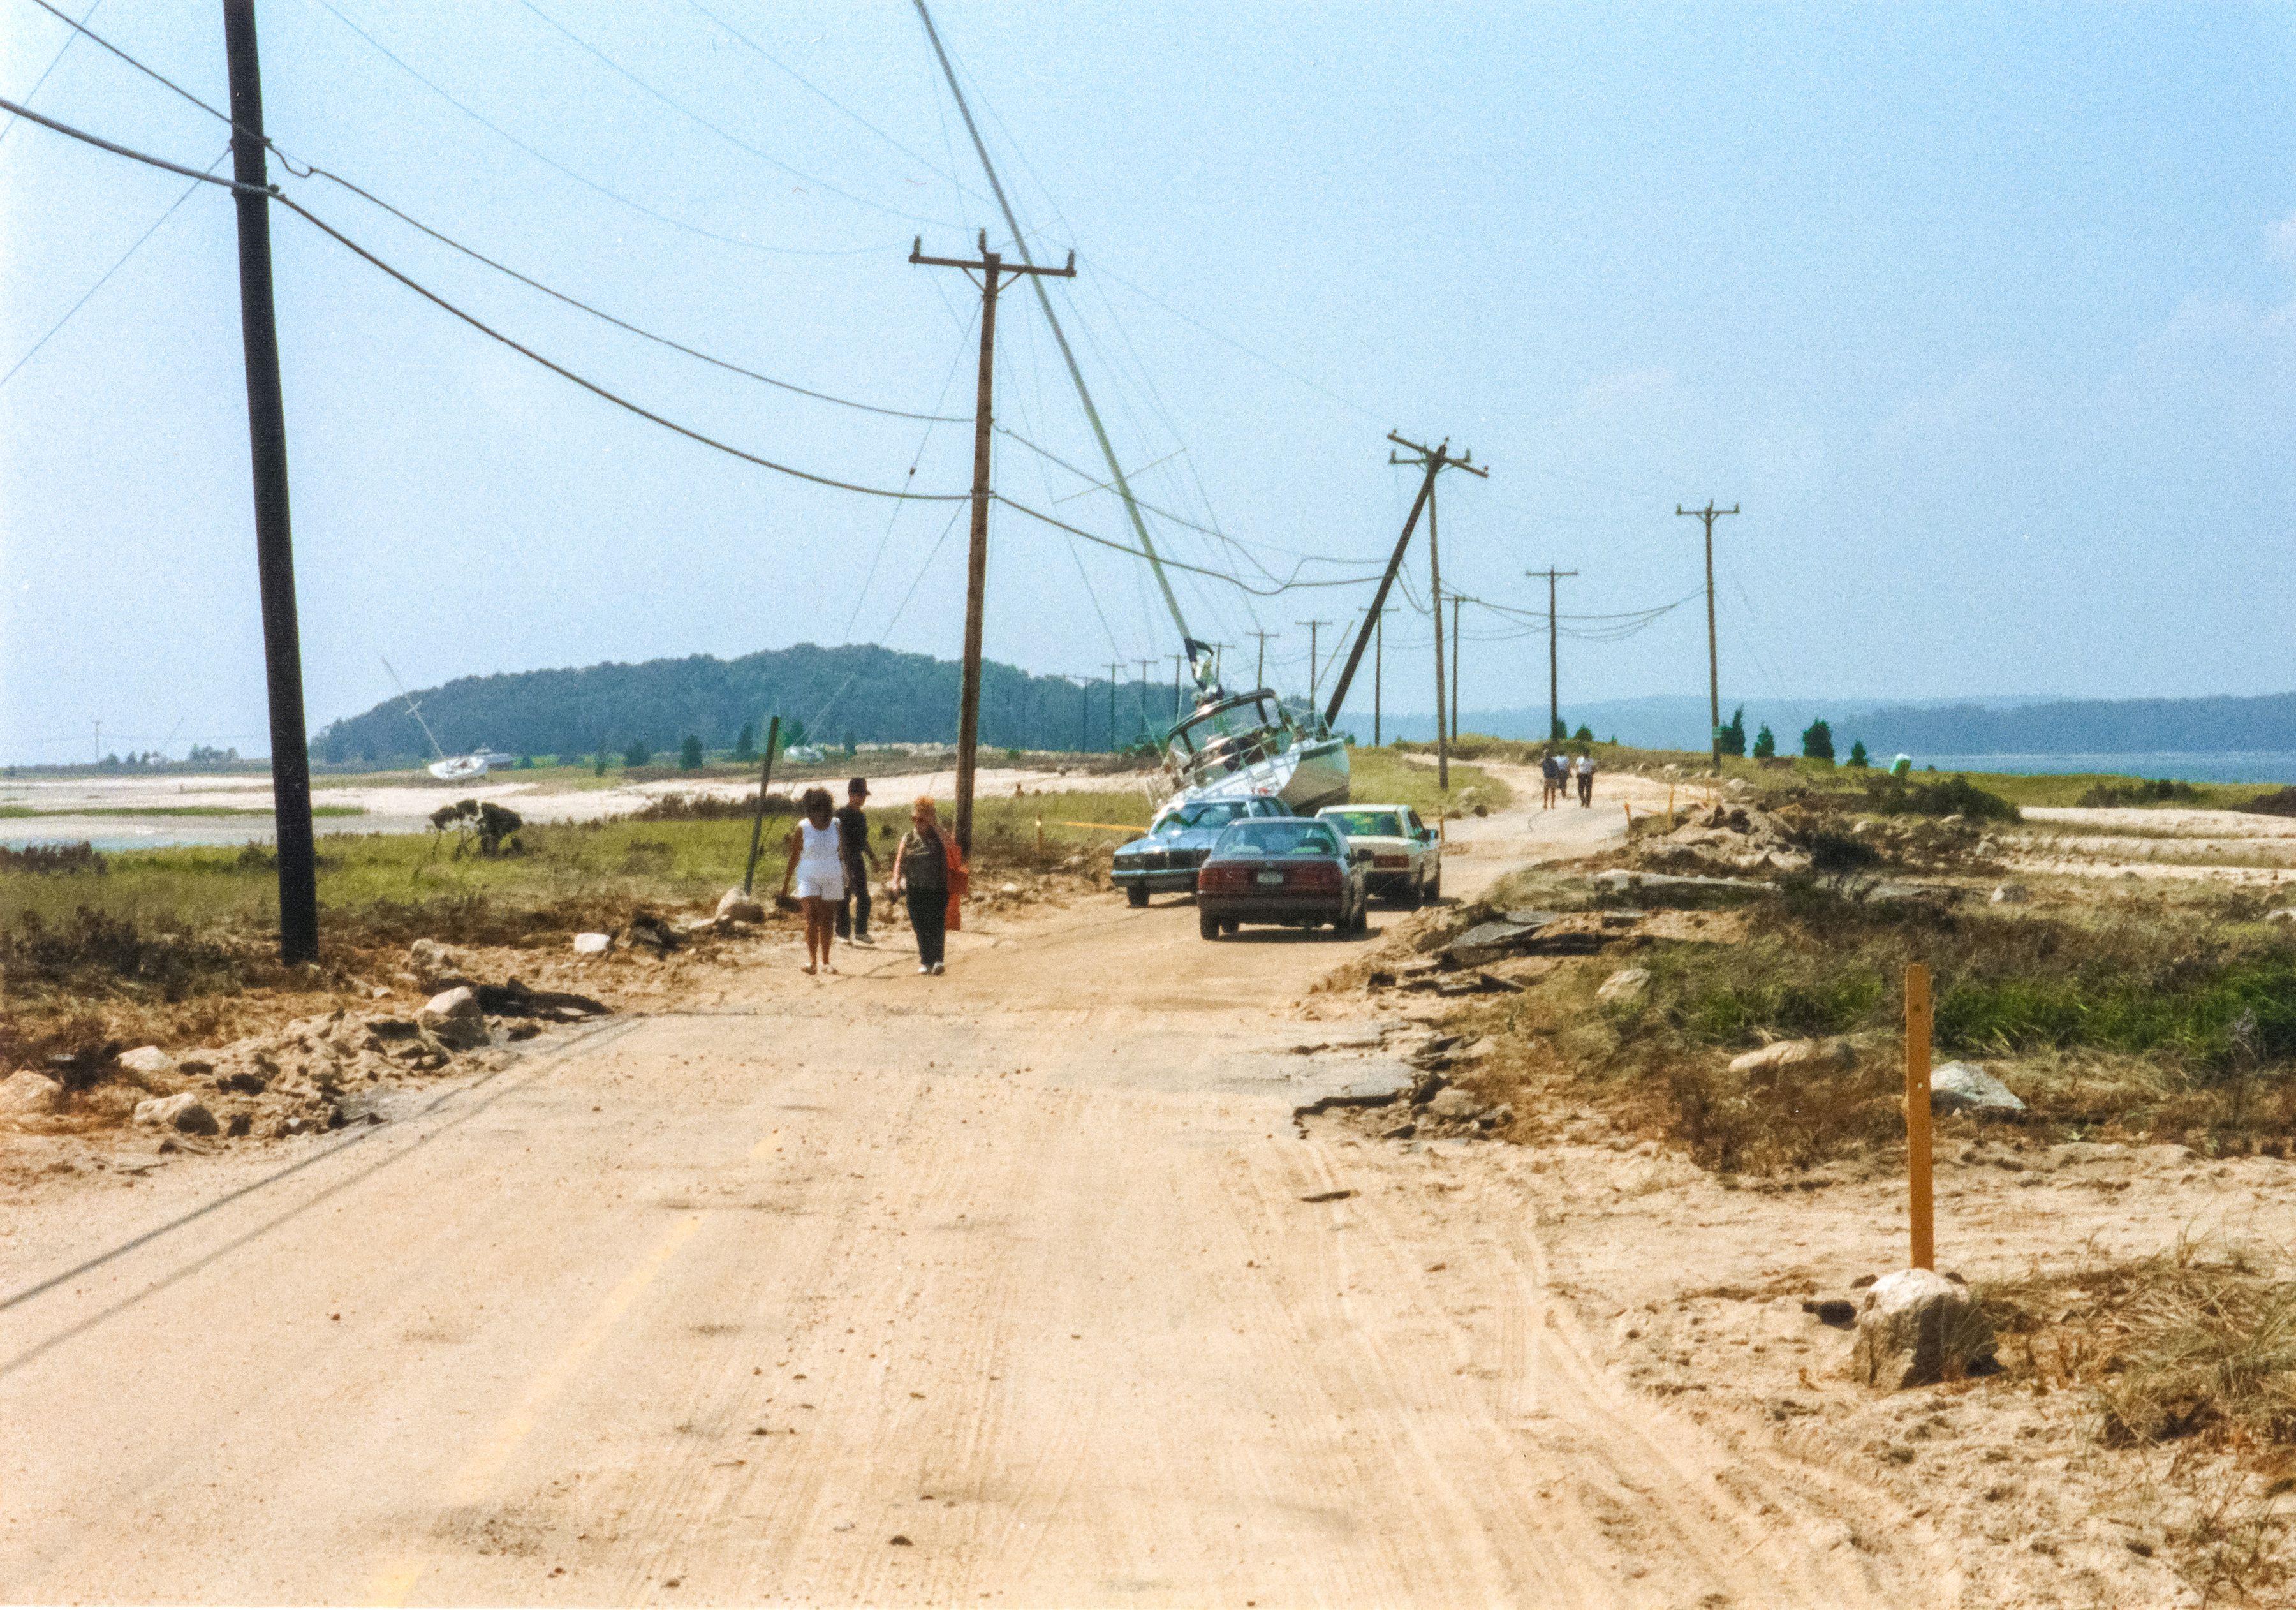 Hurricane Bob Aftermath Causeway Road Towards Hog Island And Mashnee Island Road Country Roads